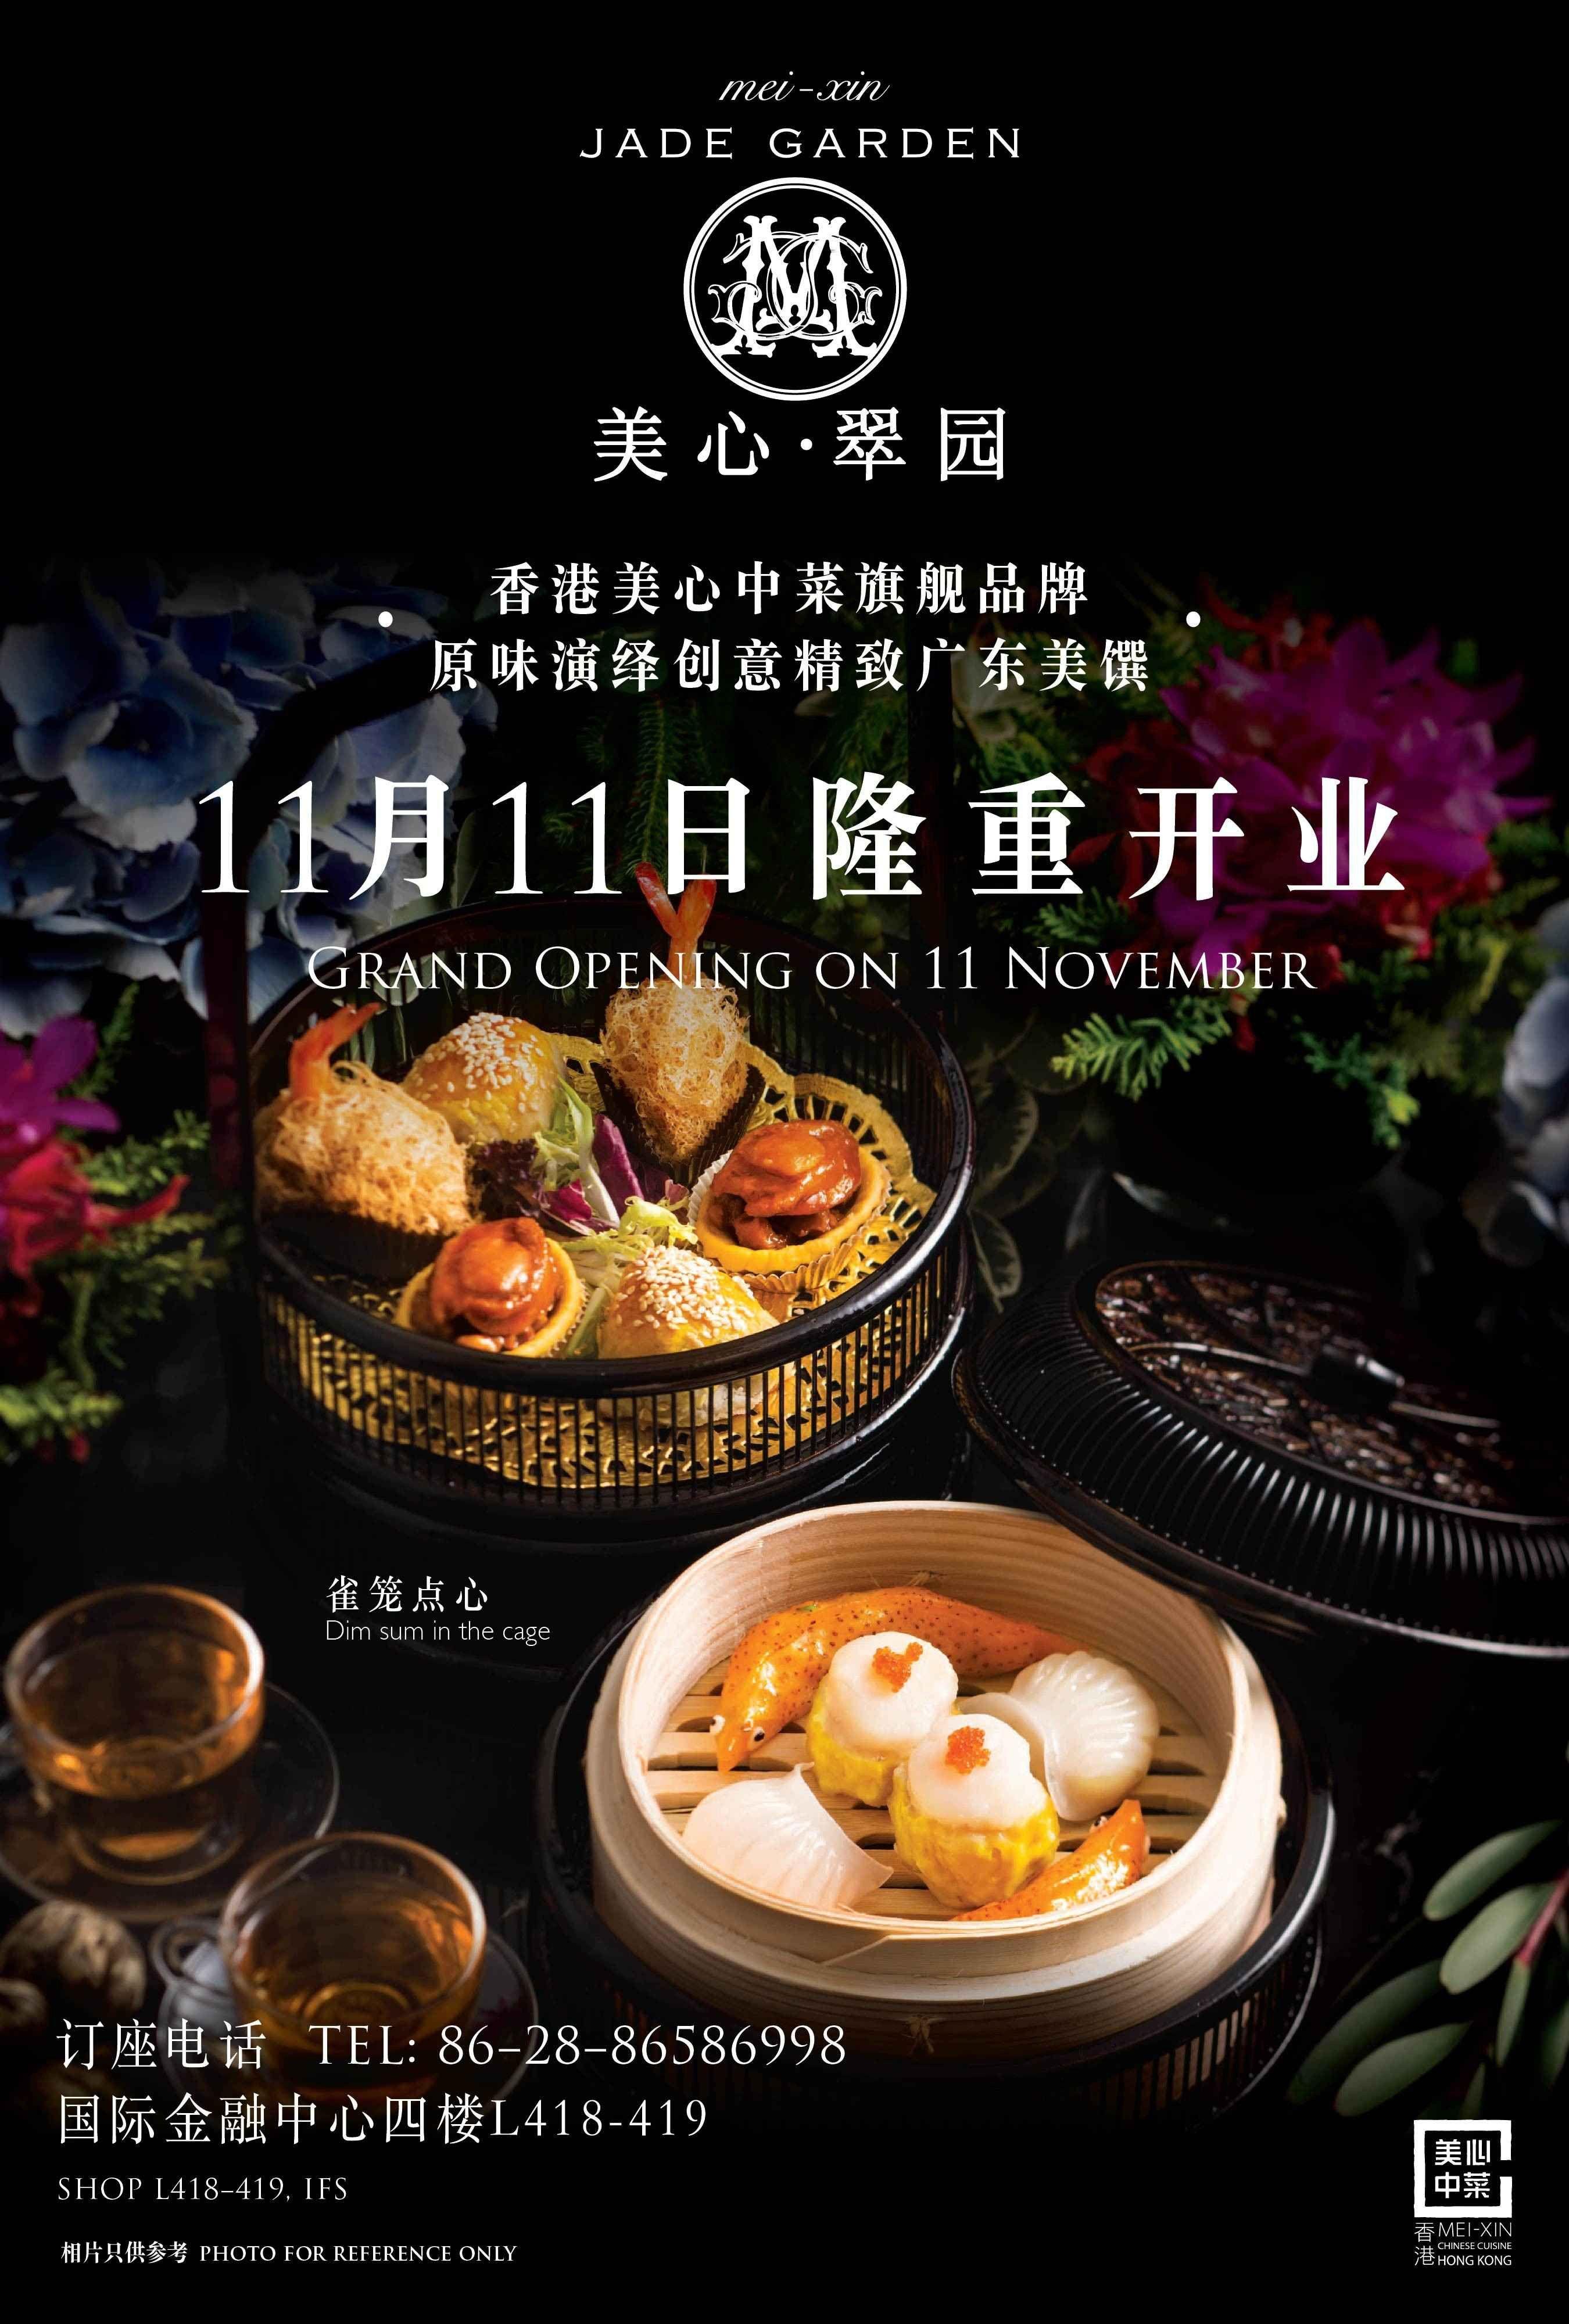 Pin By Chen Hou On Food Beverage Ads Food Design Food Food Poster Design